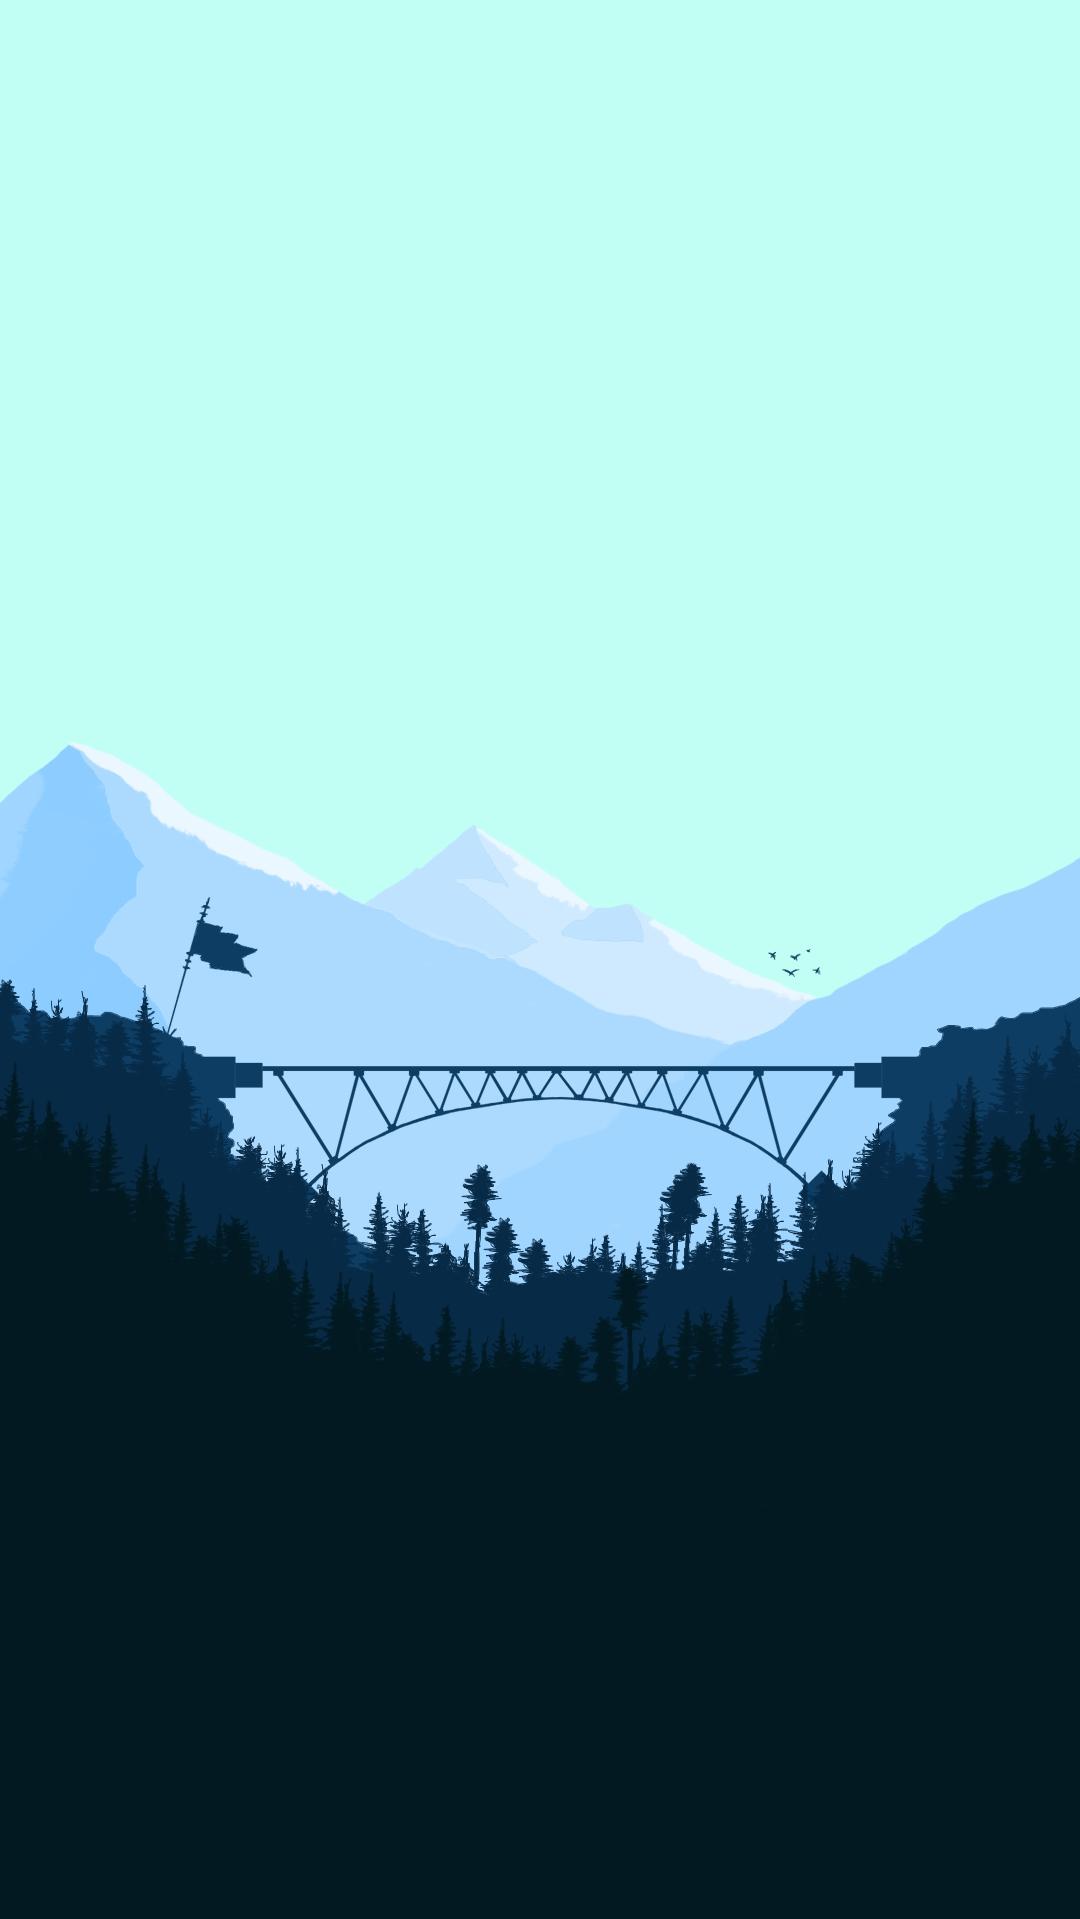 Animated Christmas Desktop Wallpaper Minimal Bridge Digital Art Iphone Wallpaper Iphone